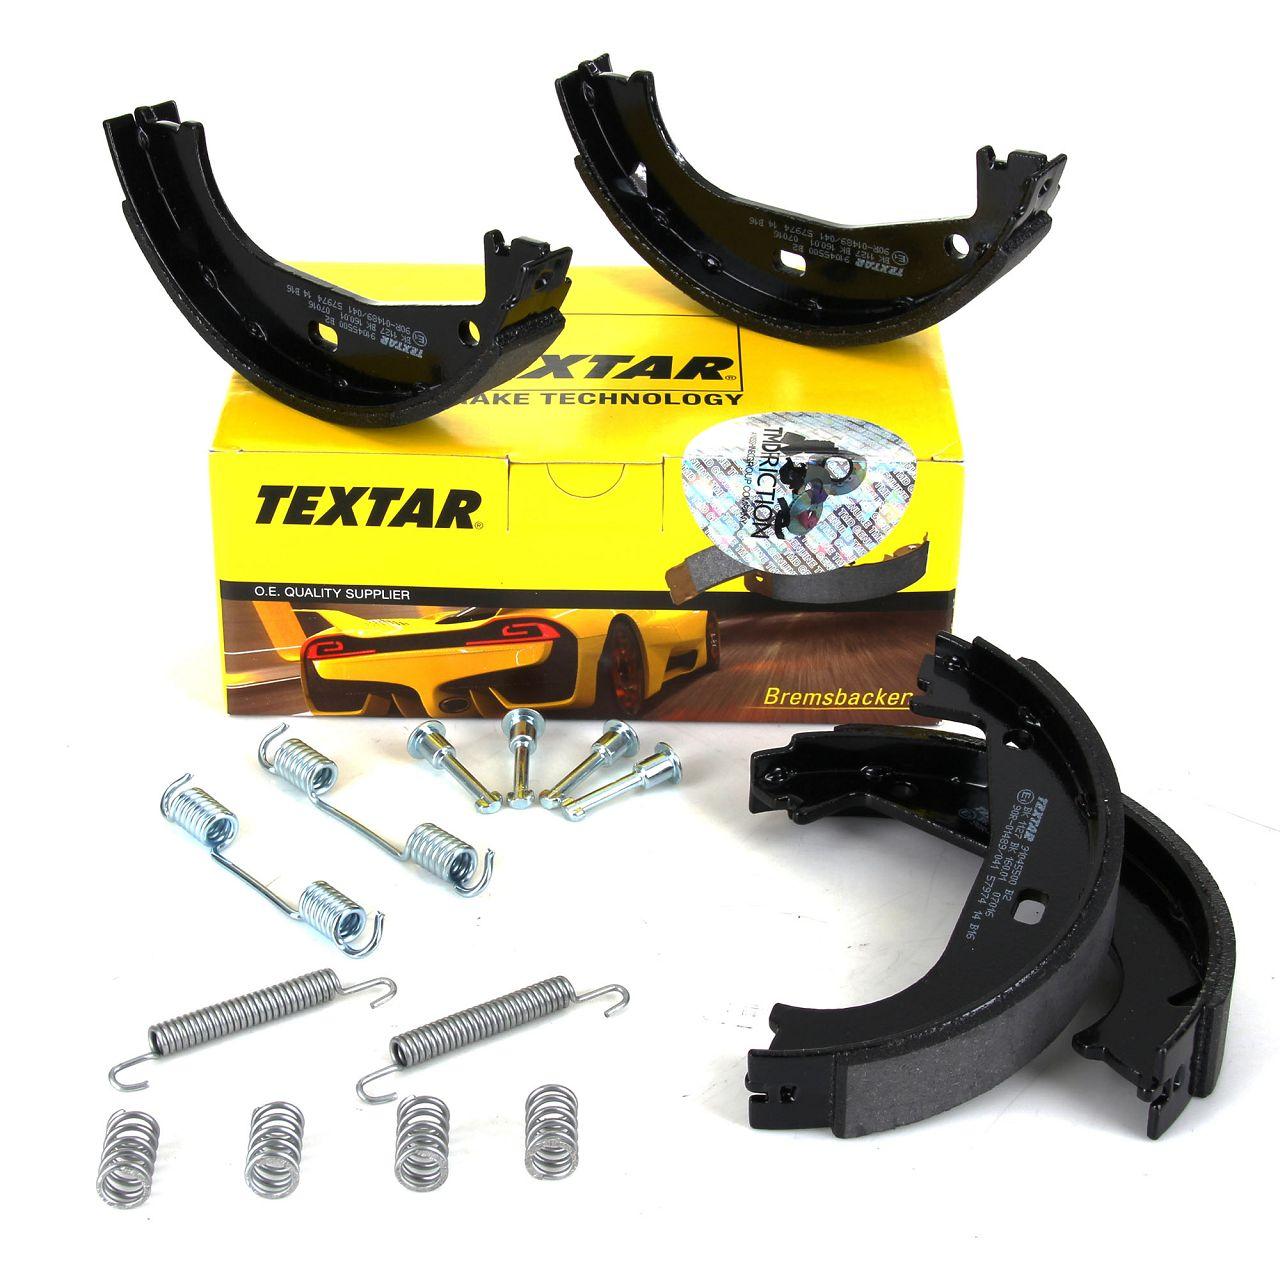 TEXTAR 91045500 Bremsbacken + Federn Satz BMW E36 316-328i Z1 2.5 Z3 E36 1.8-3.0 hinten